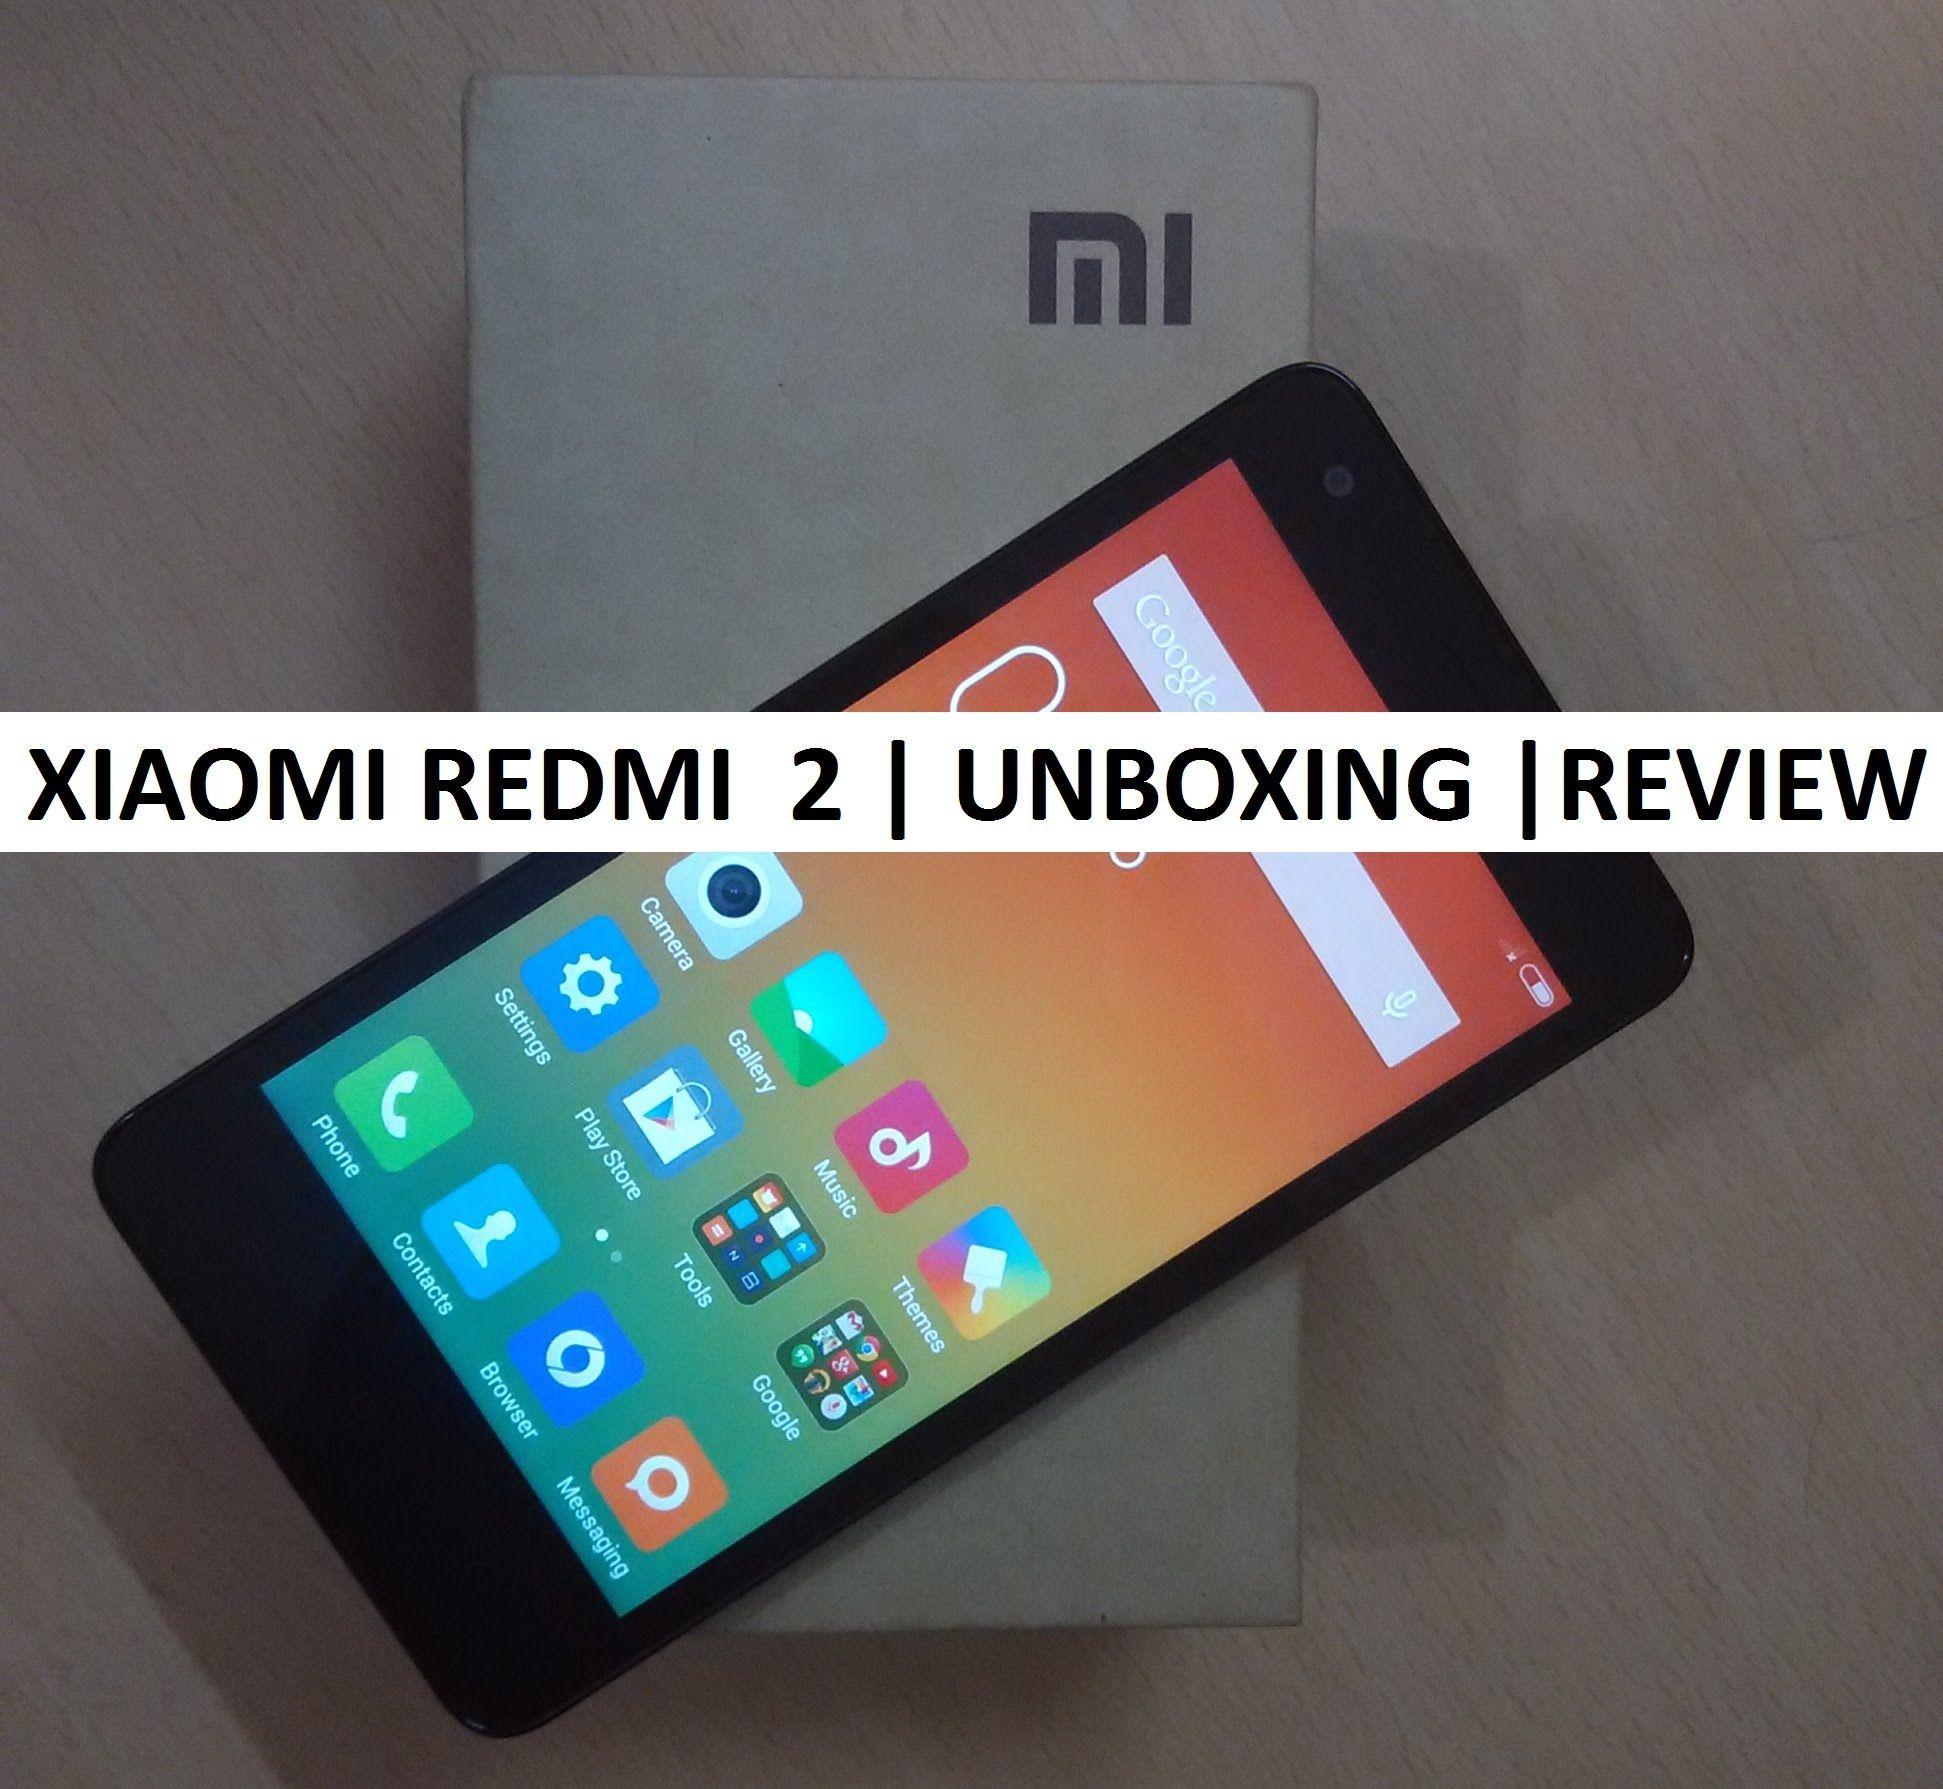 Xiaomi Redmi 2 Unboxing Review India Redmi 2 Product Launch India